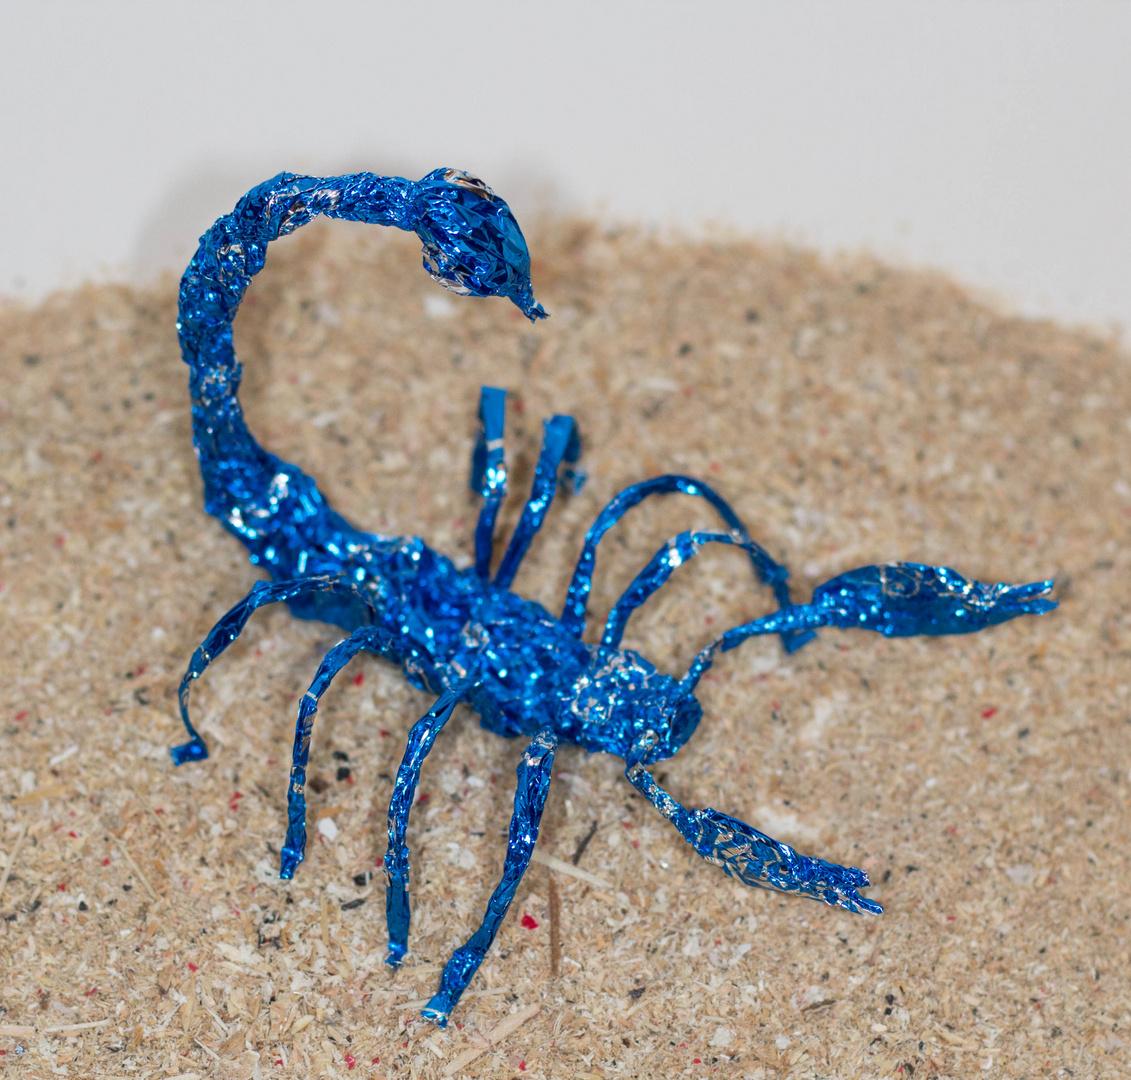 Skorpion aus Schokokusspapier